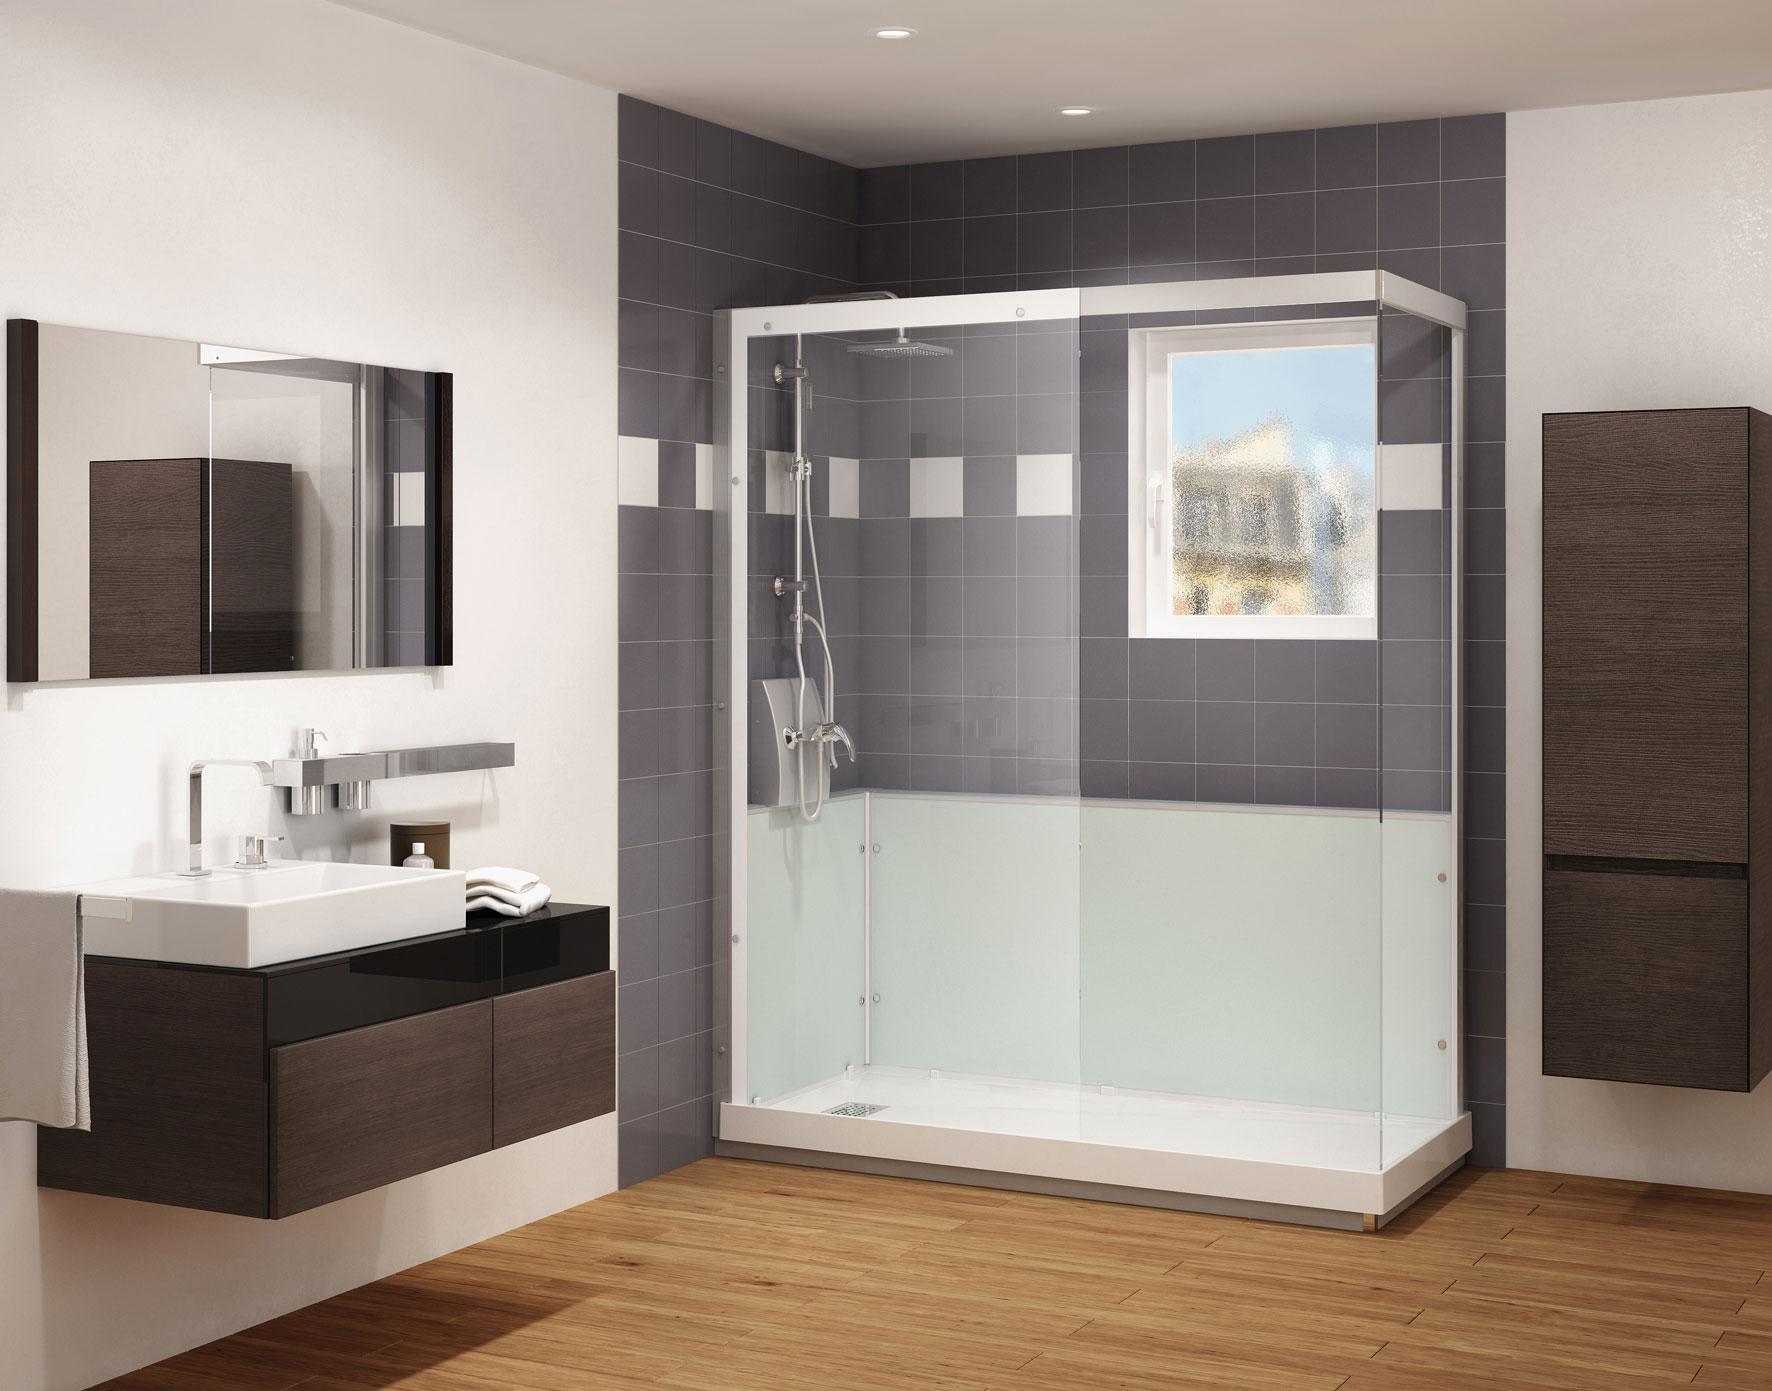 Grandform presenta easy ducha la soluci n m s r pida del for Duchas modernas de obra